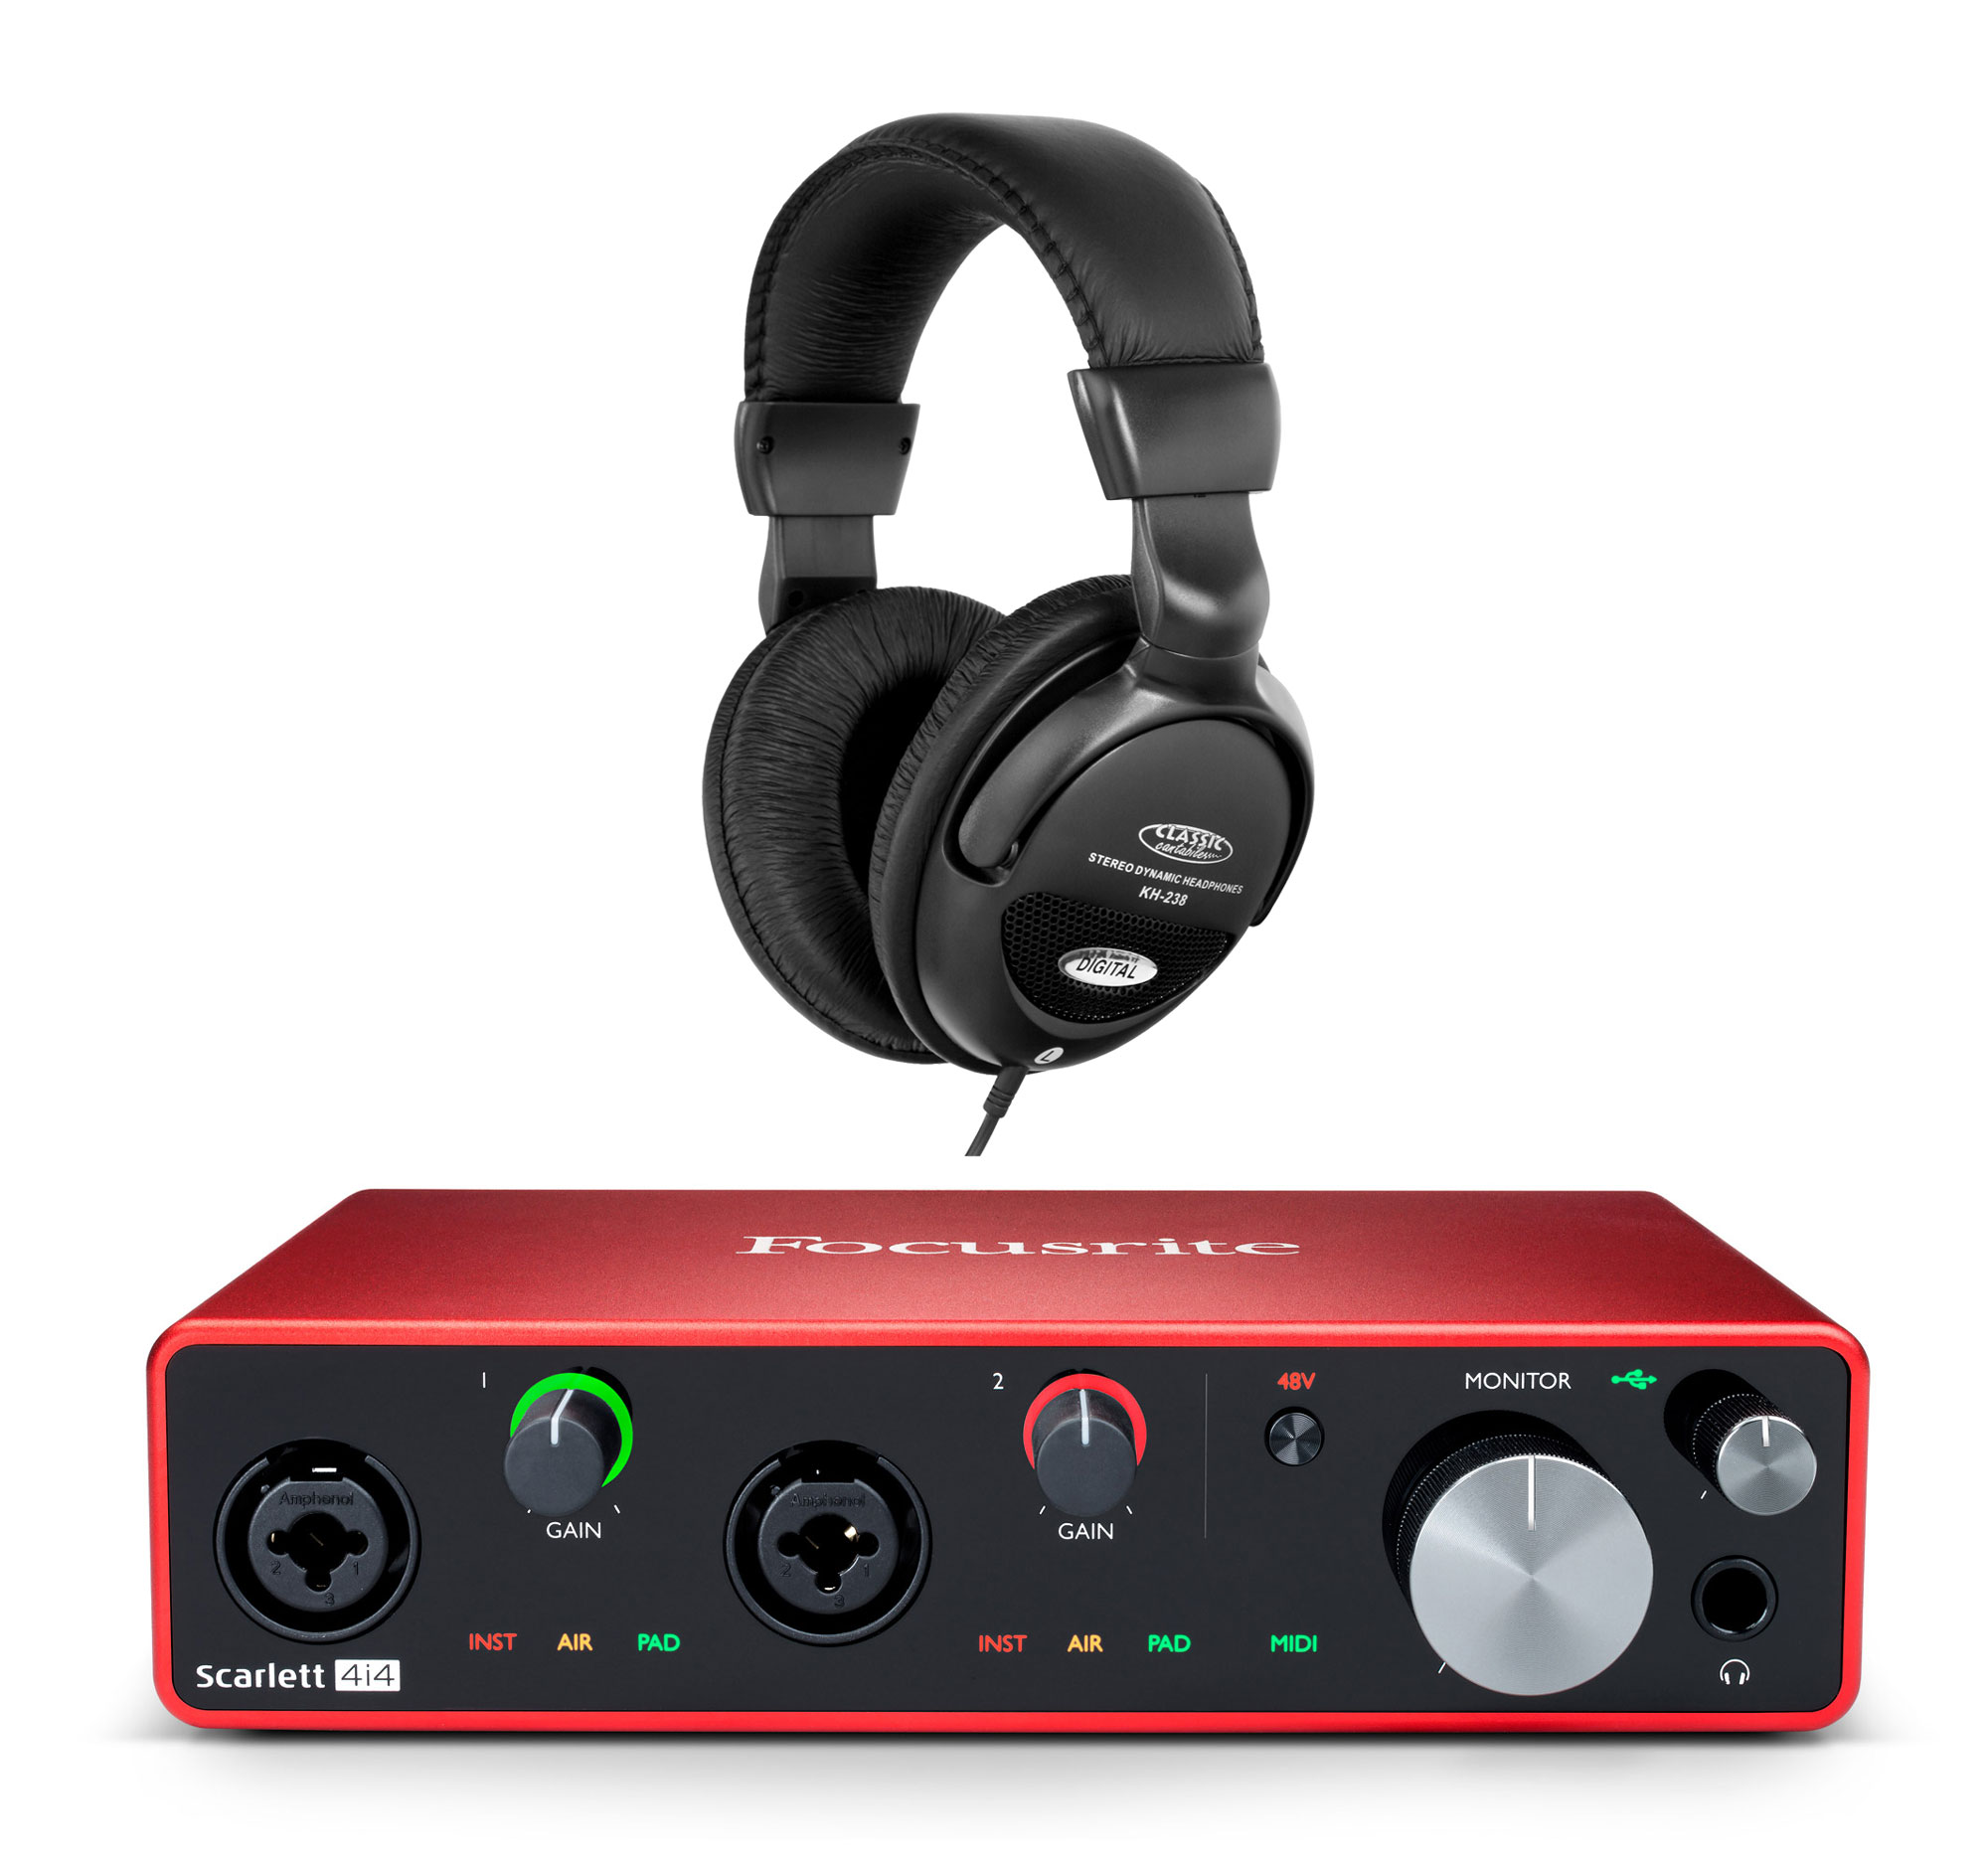 Pchardware - Focusrite Scarlett 4i4 USB Audio Interface Set - Onlineshop Musikhaus Kirstein